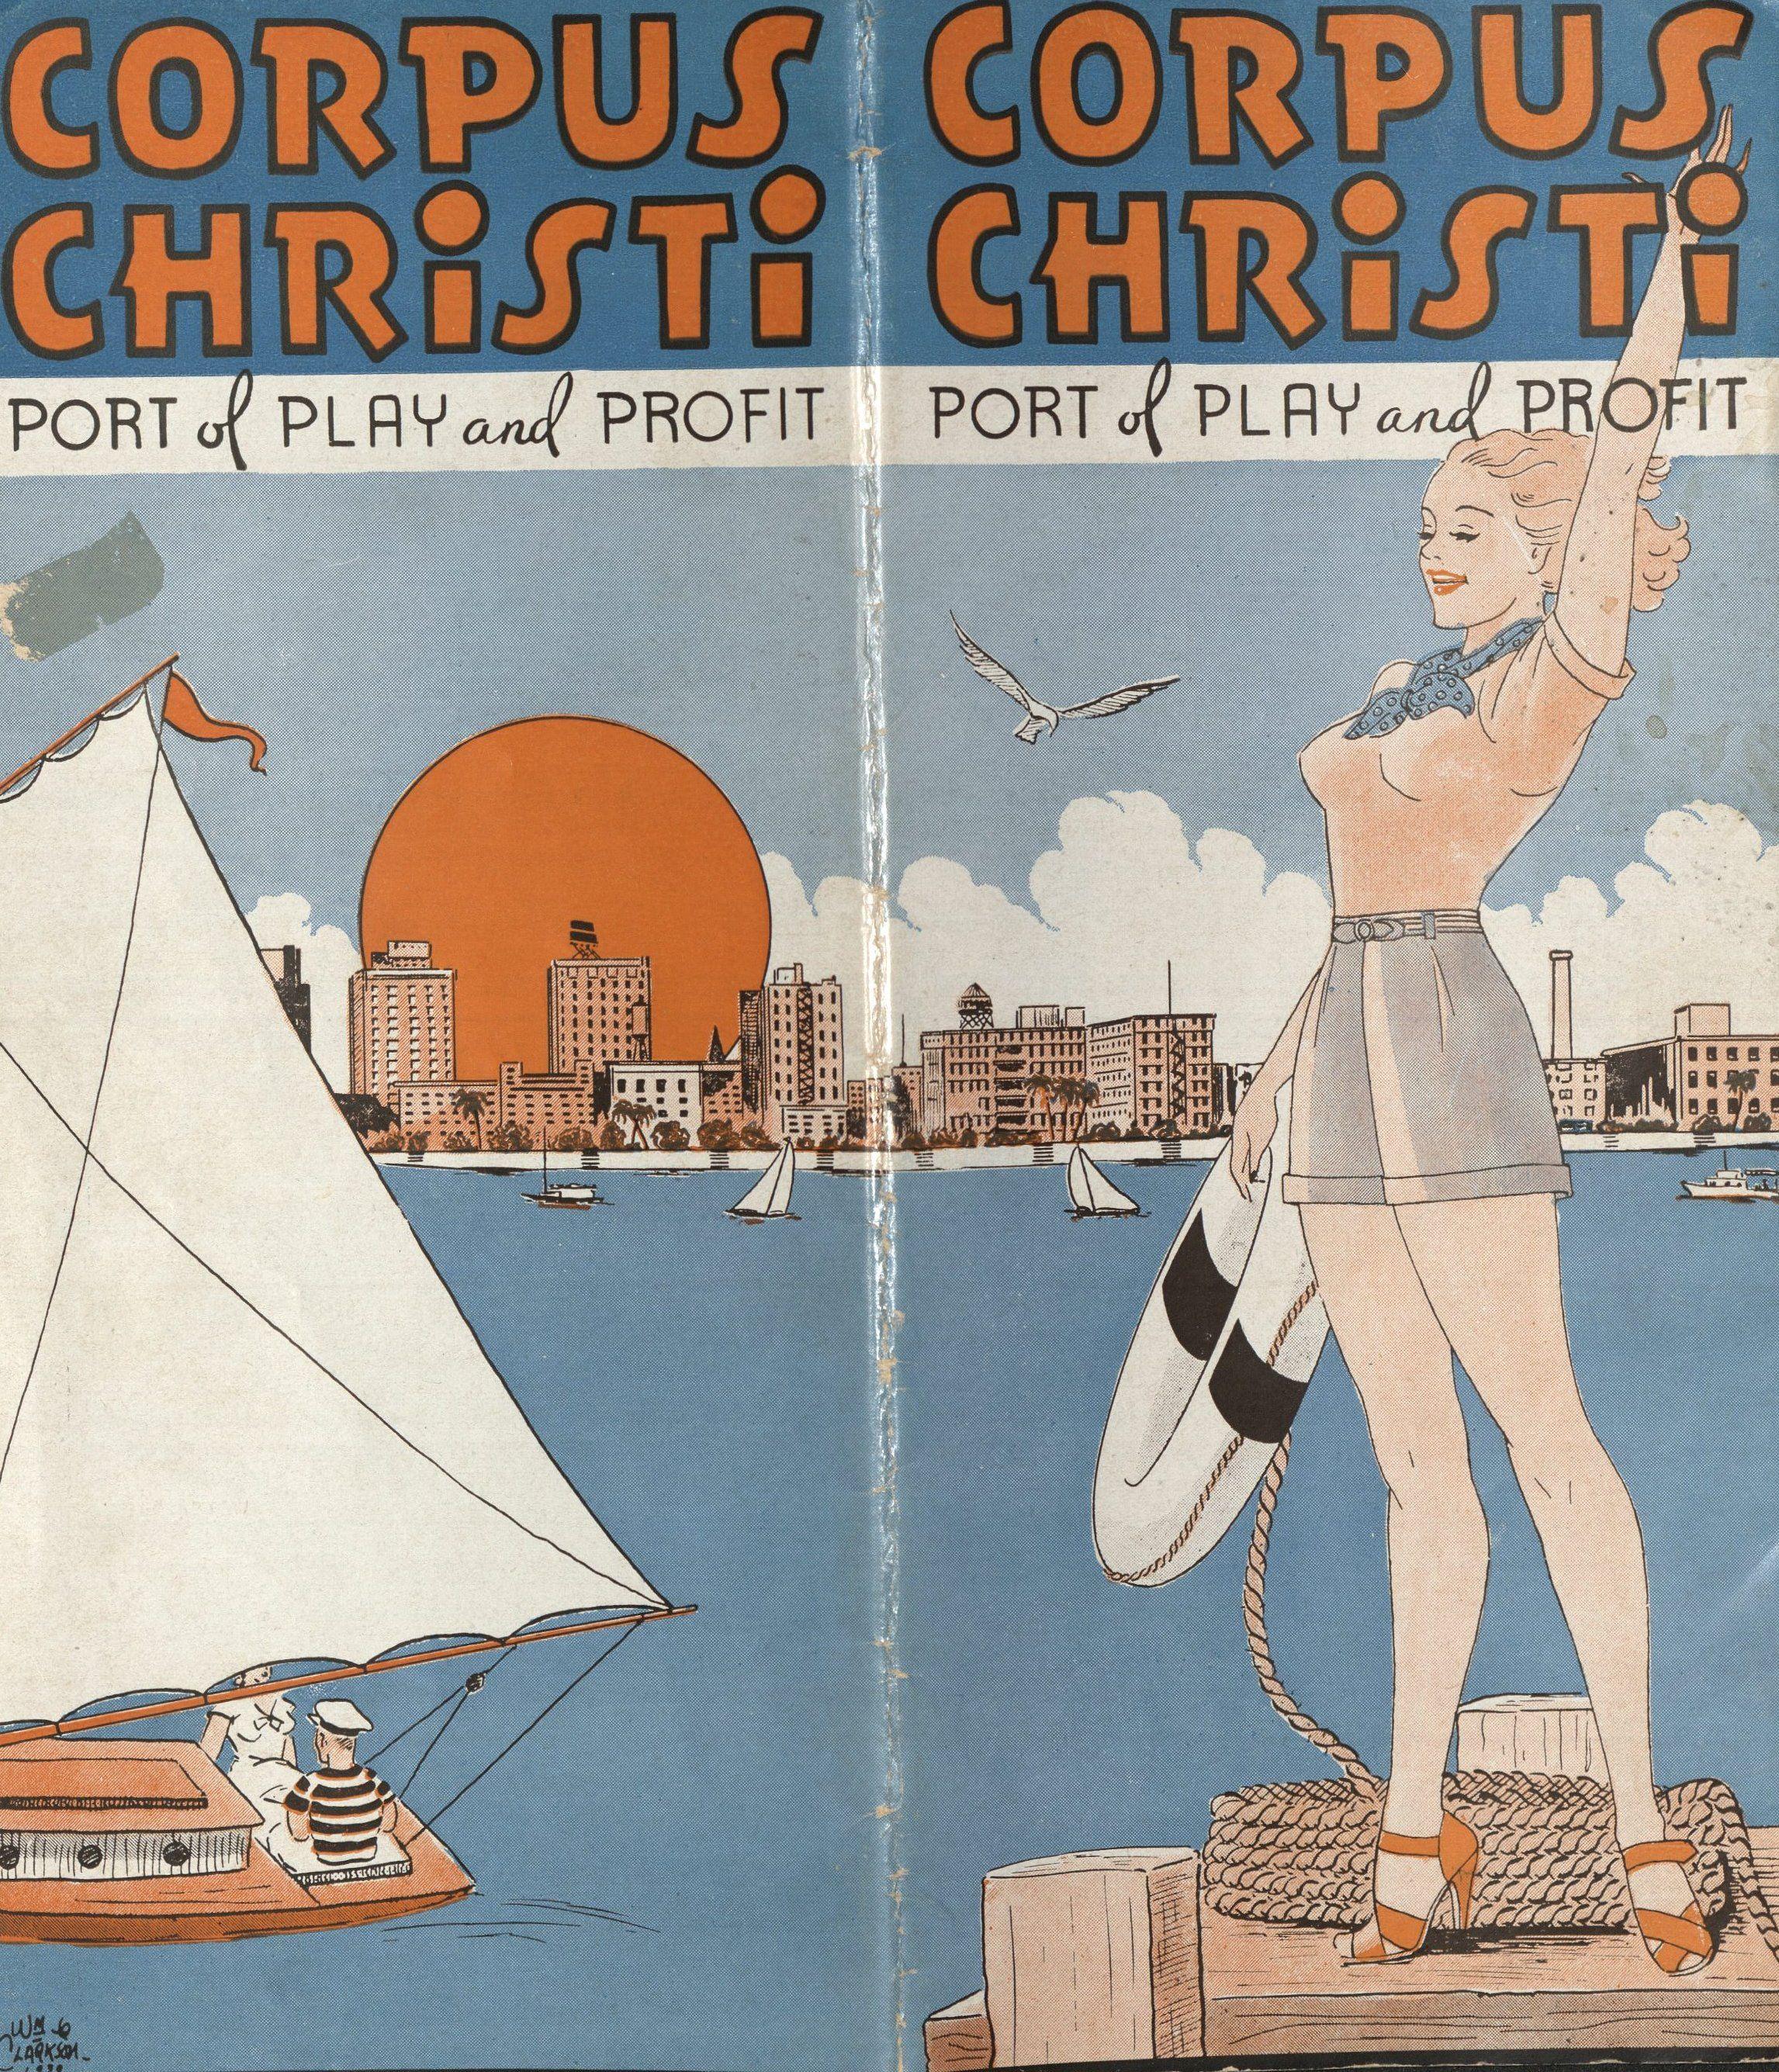 Corpus Christi: Port of Play and Profit. Corpus Christi, TX: Corpus Christi Chamber of Commerce, [1939]. Print.